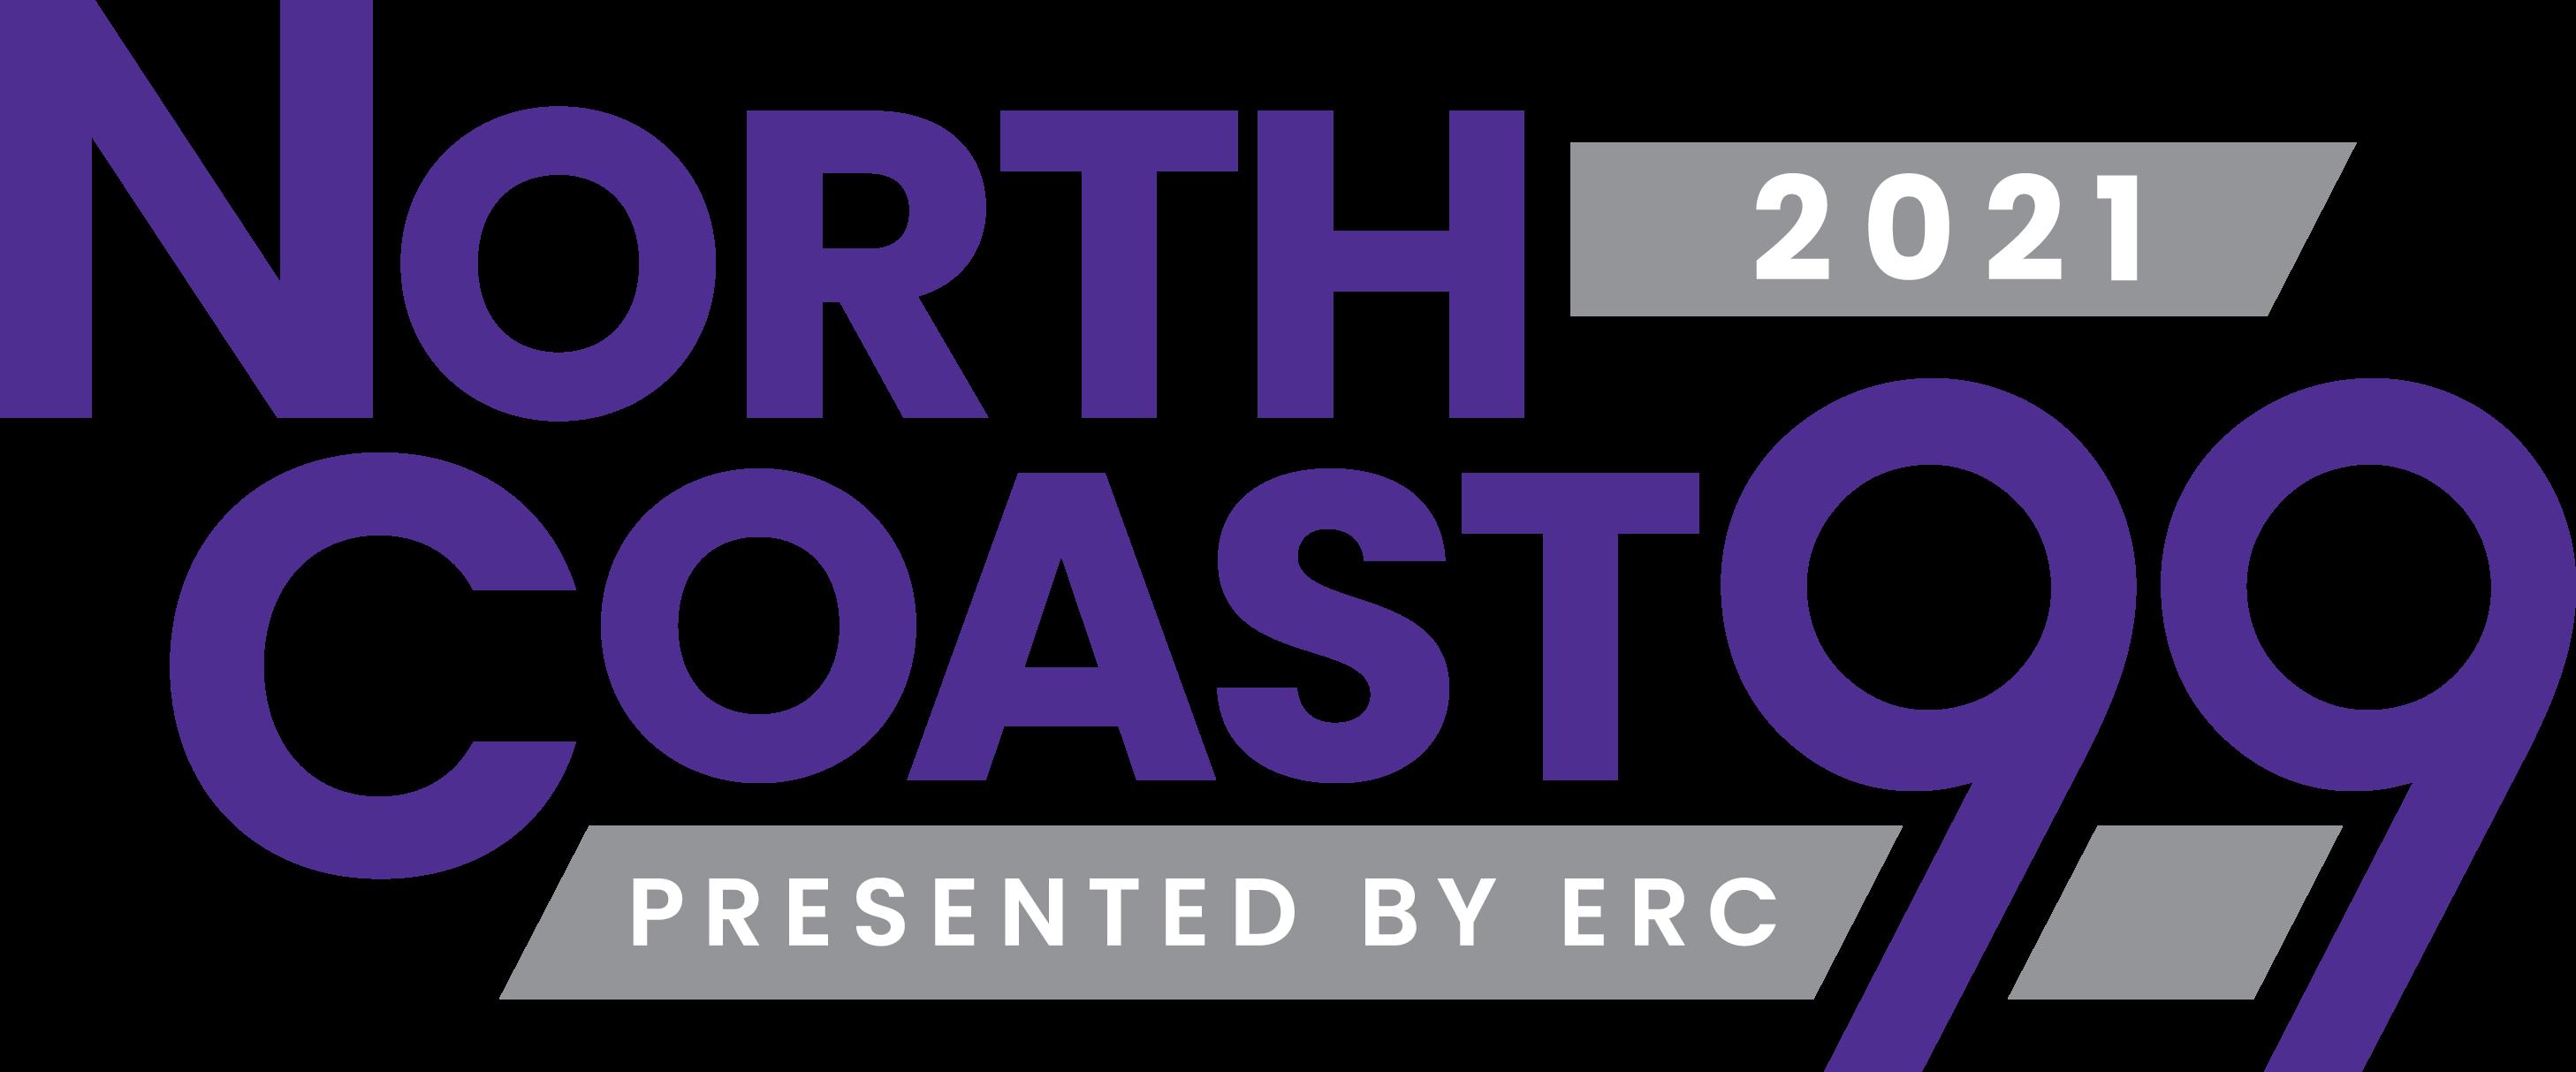 north coast logo